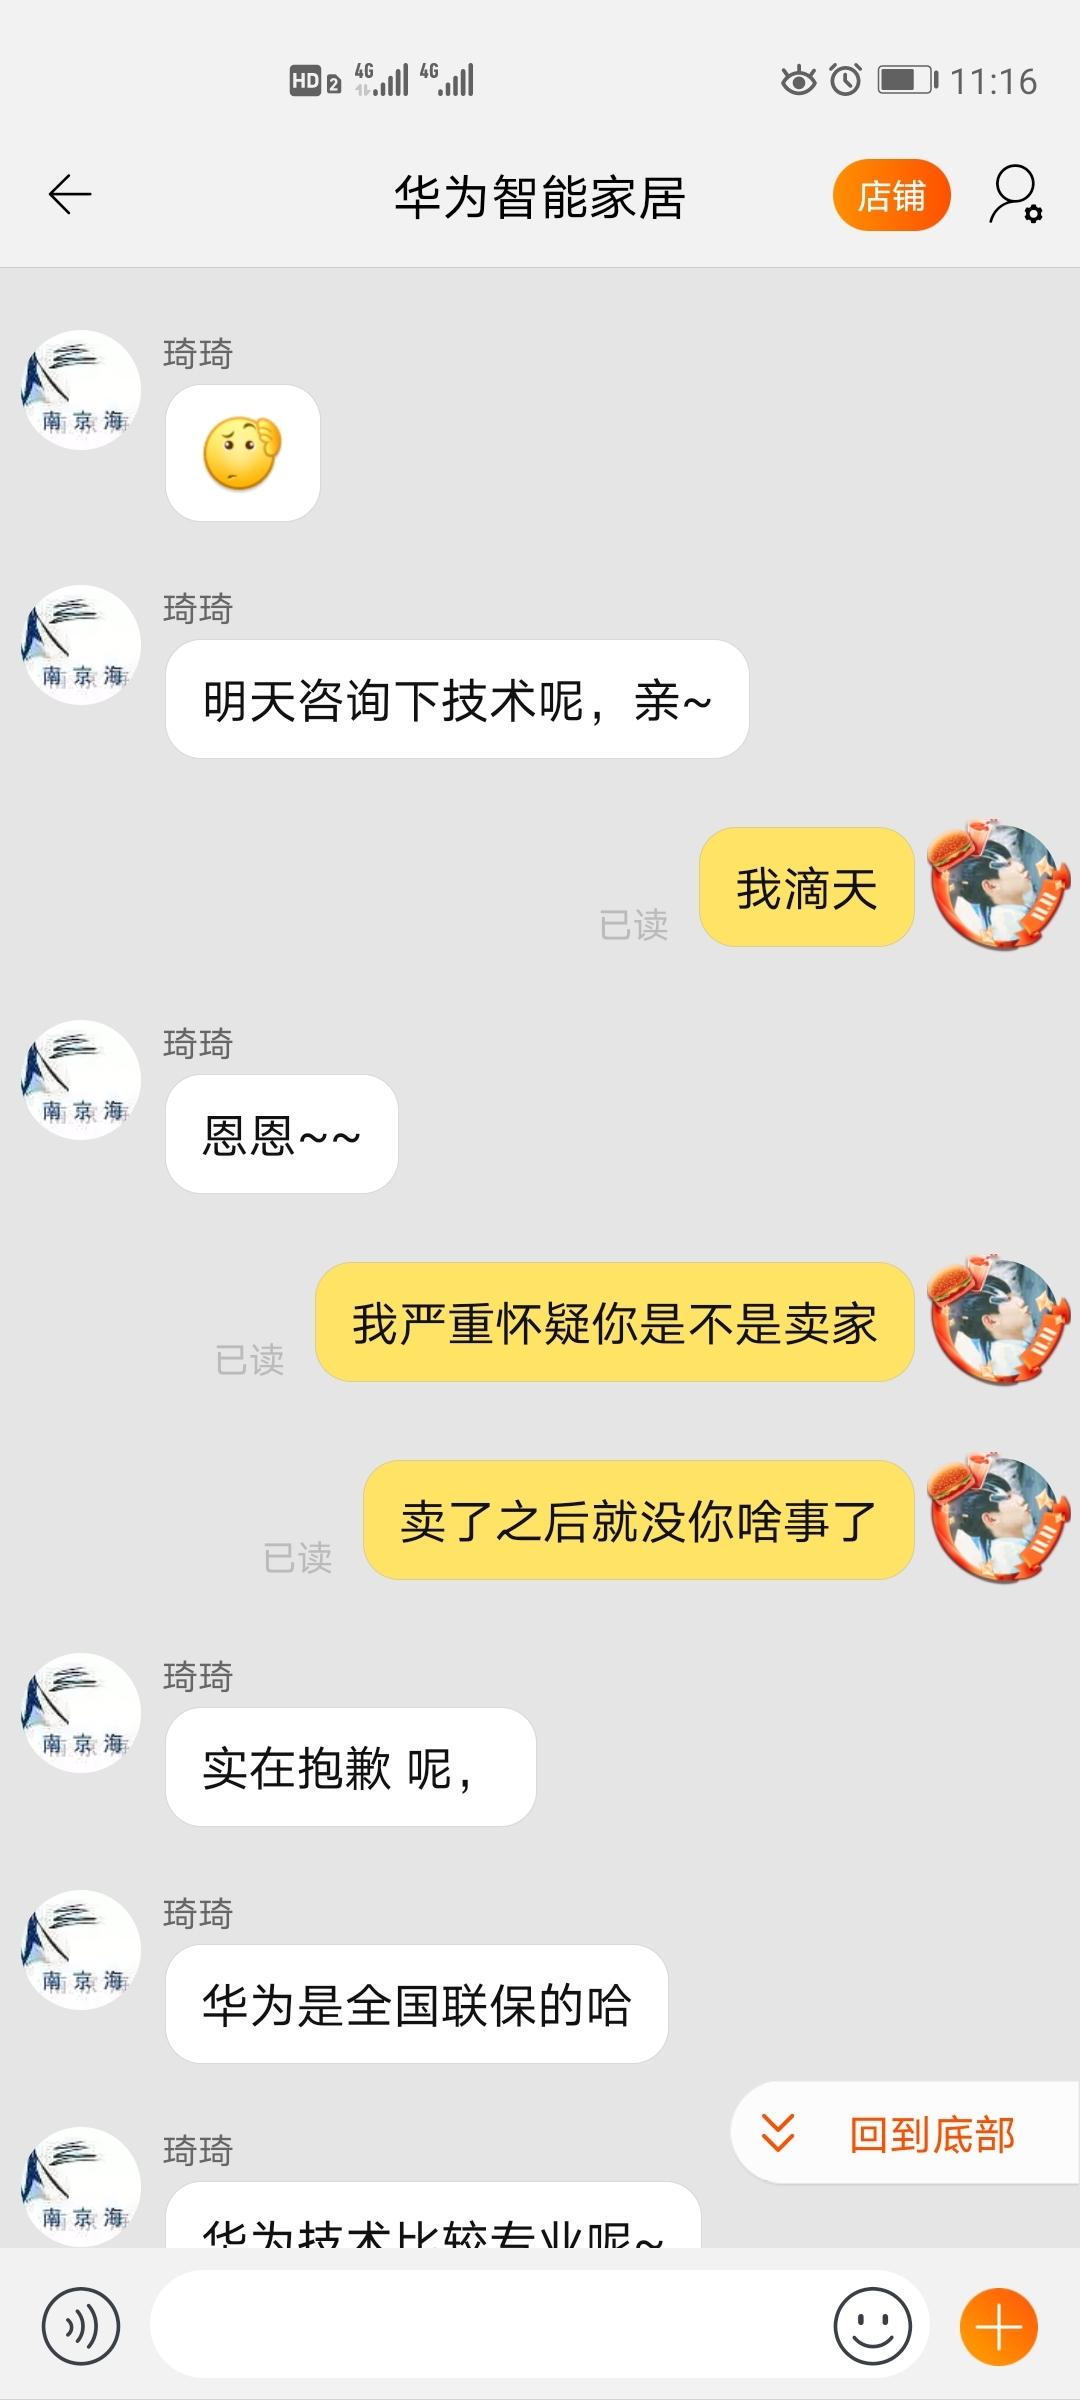 Screenshot_20200508_111646_com.taobao.taobao.jpg